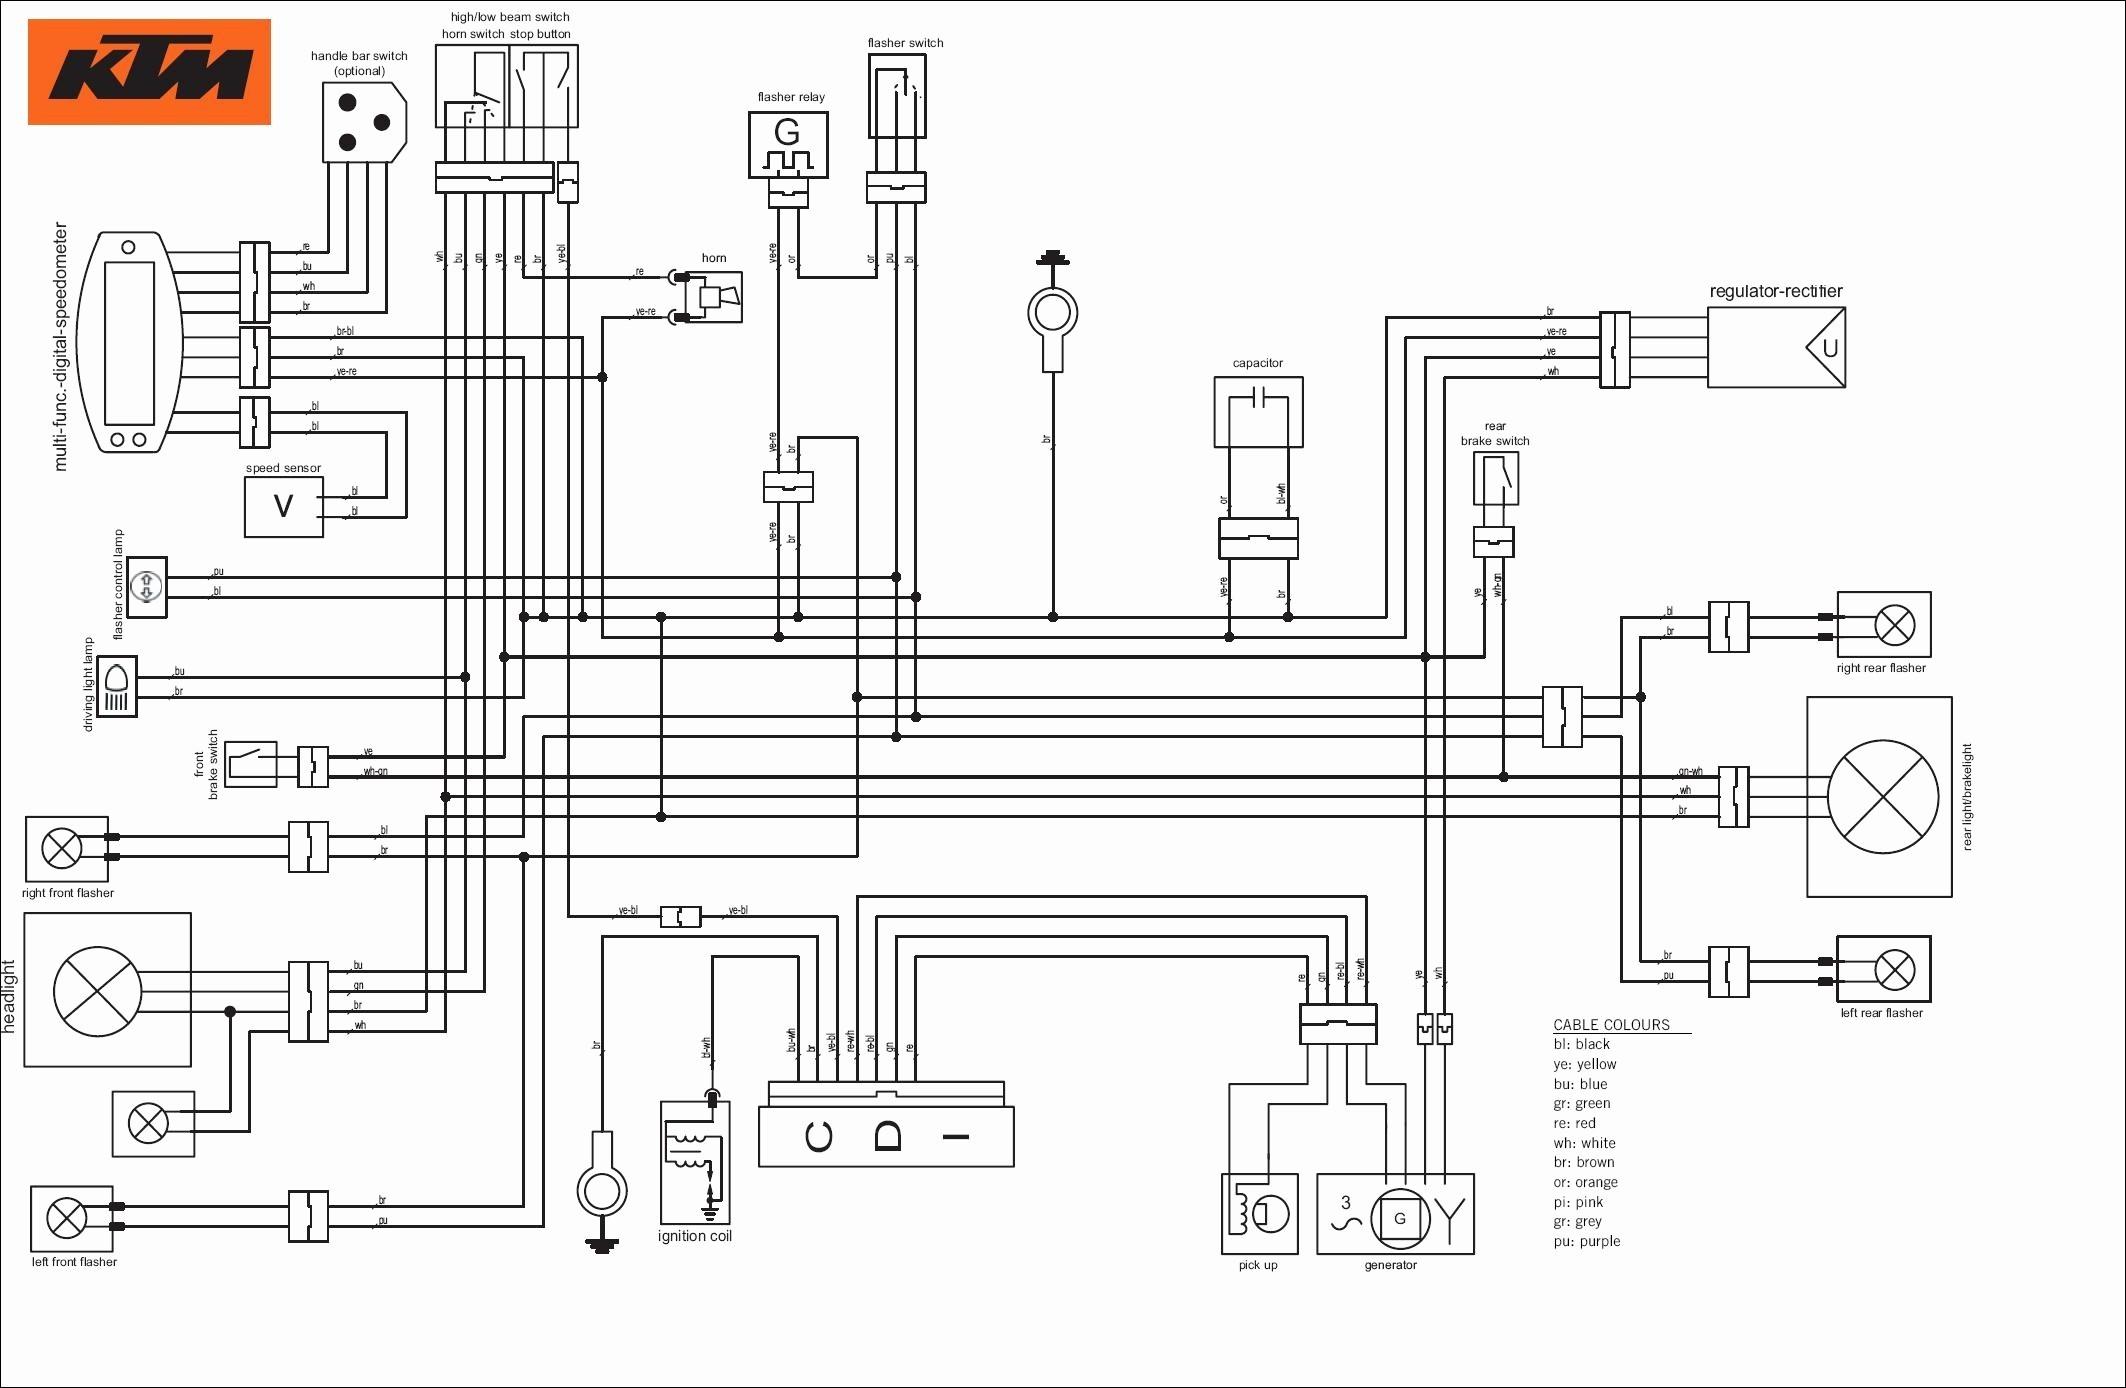 john deere lt133 wiring diagram inspirational lovely john deere lt133 wiring diagram of john deere lt133 wiring diagram